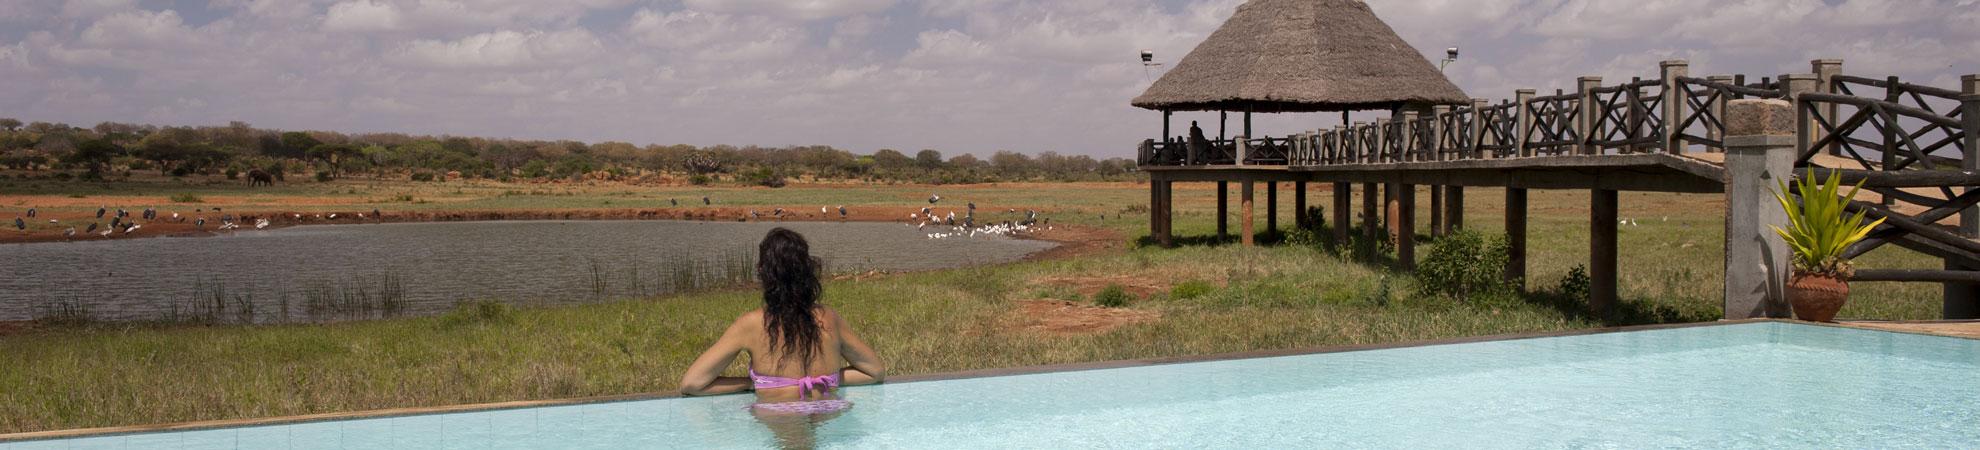 Séjour Kenya safari et plage